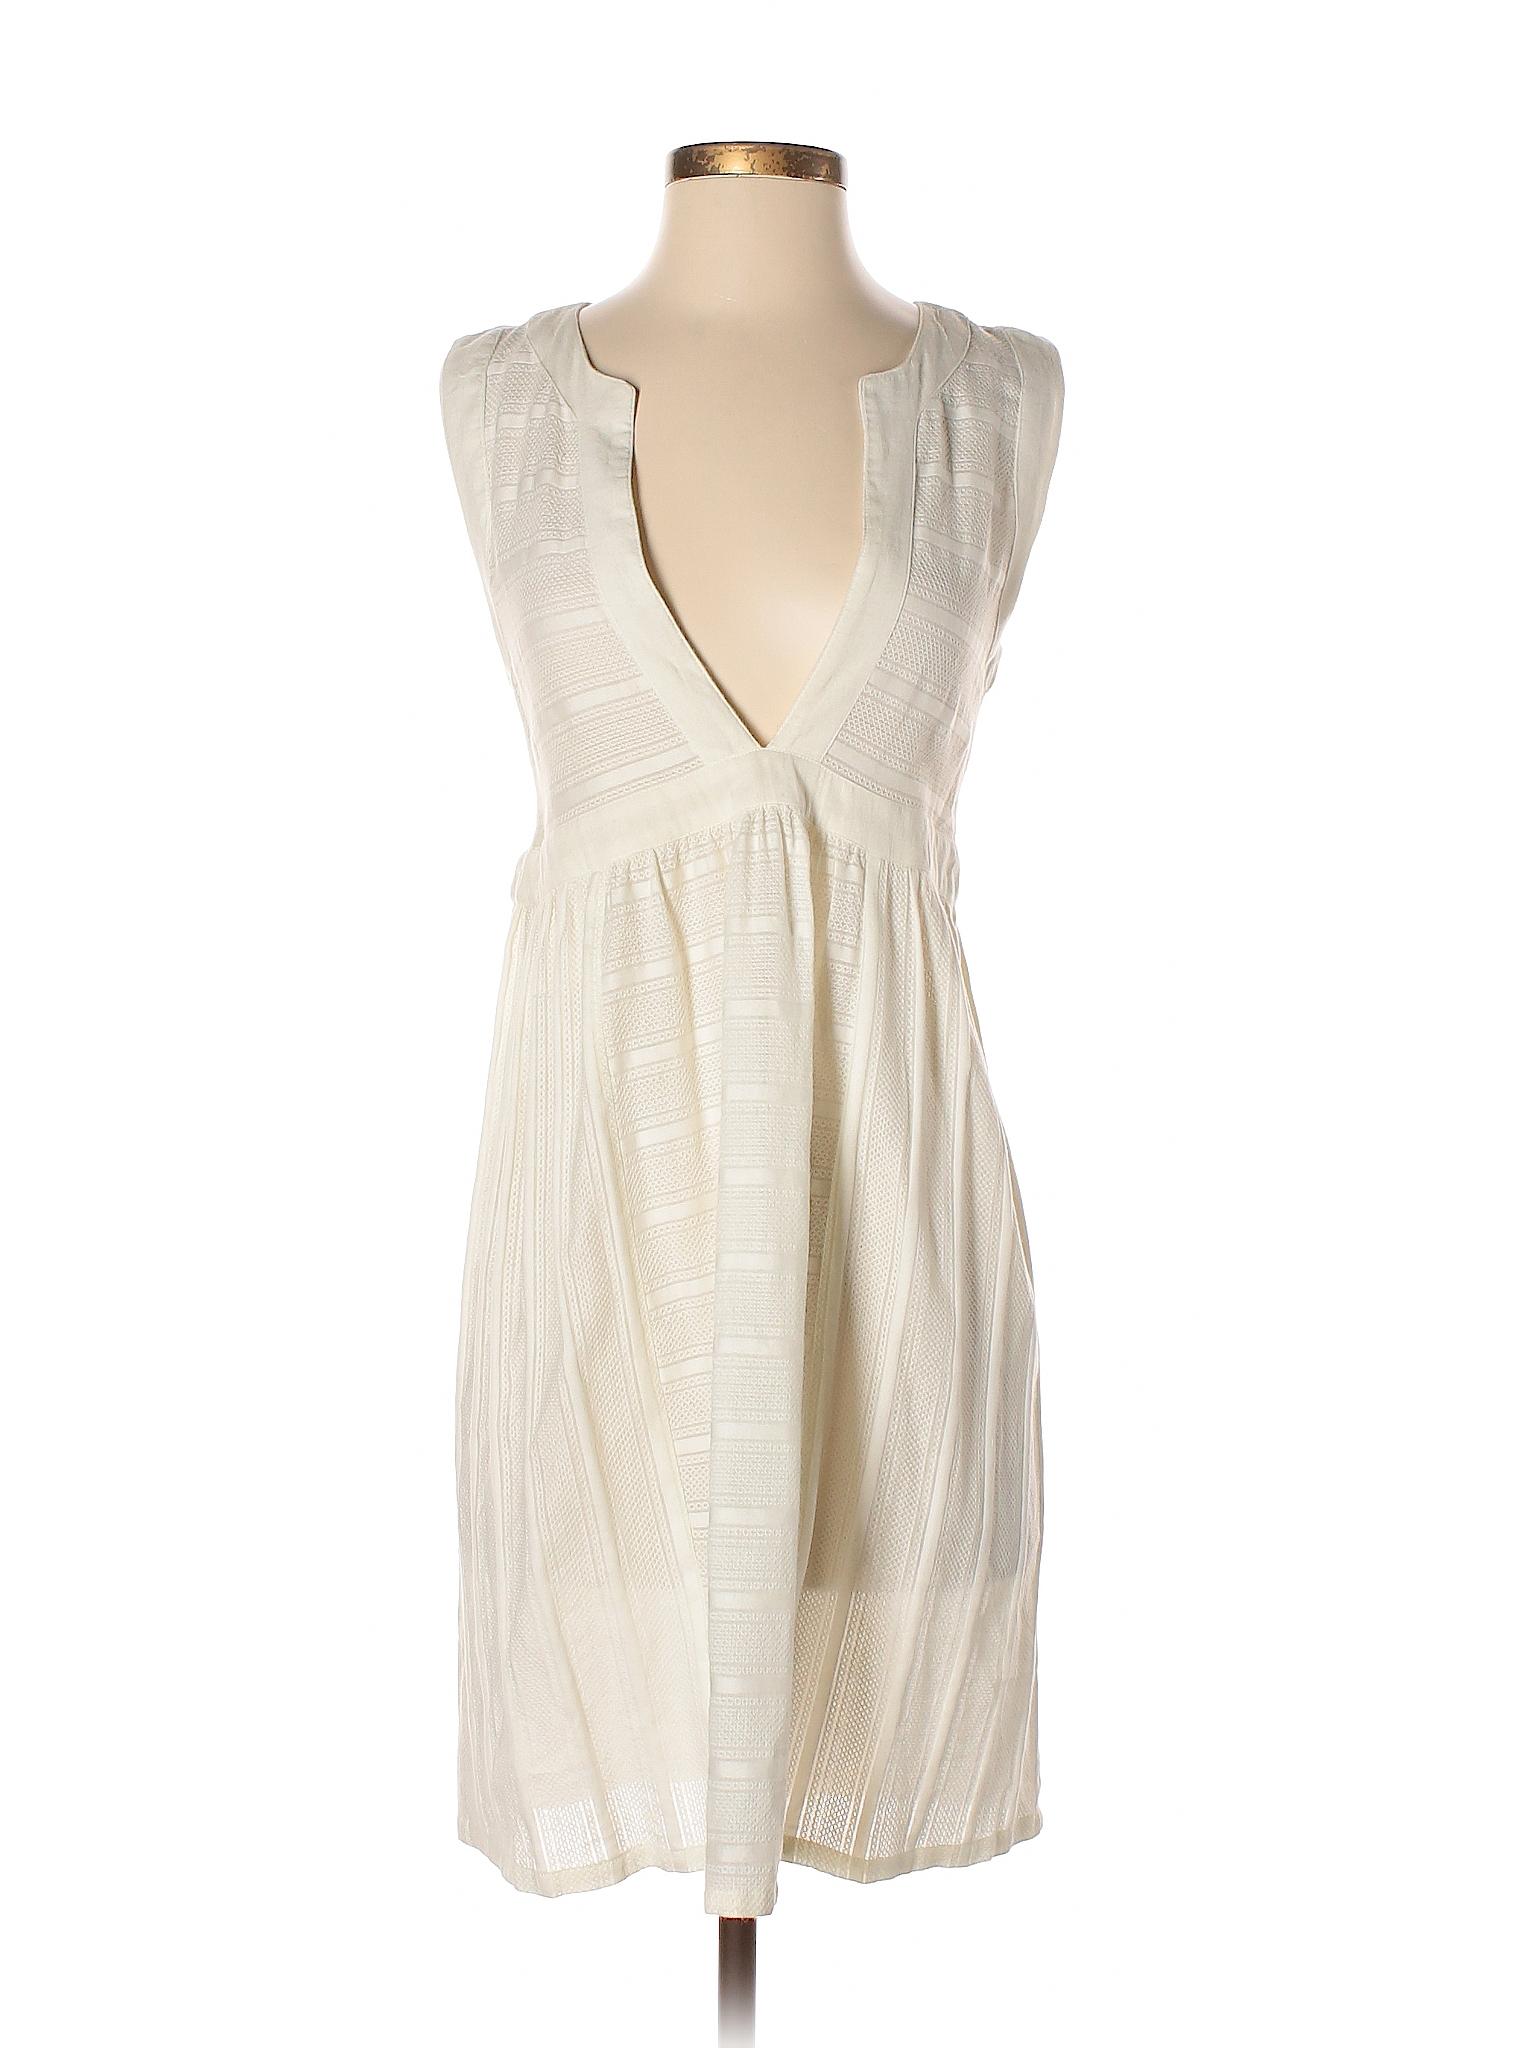 DRA Selling Casual Dress Selling Dress Casual DRA B5ZqU